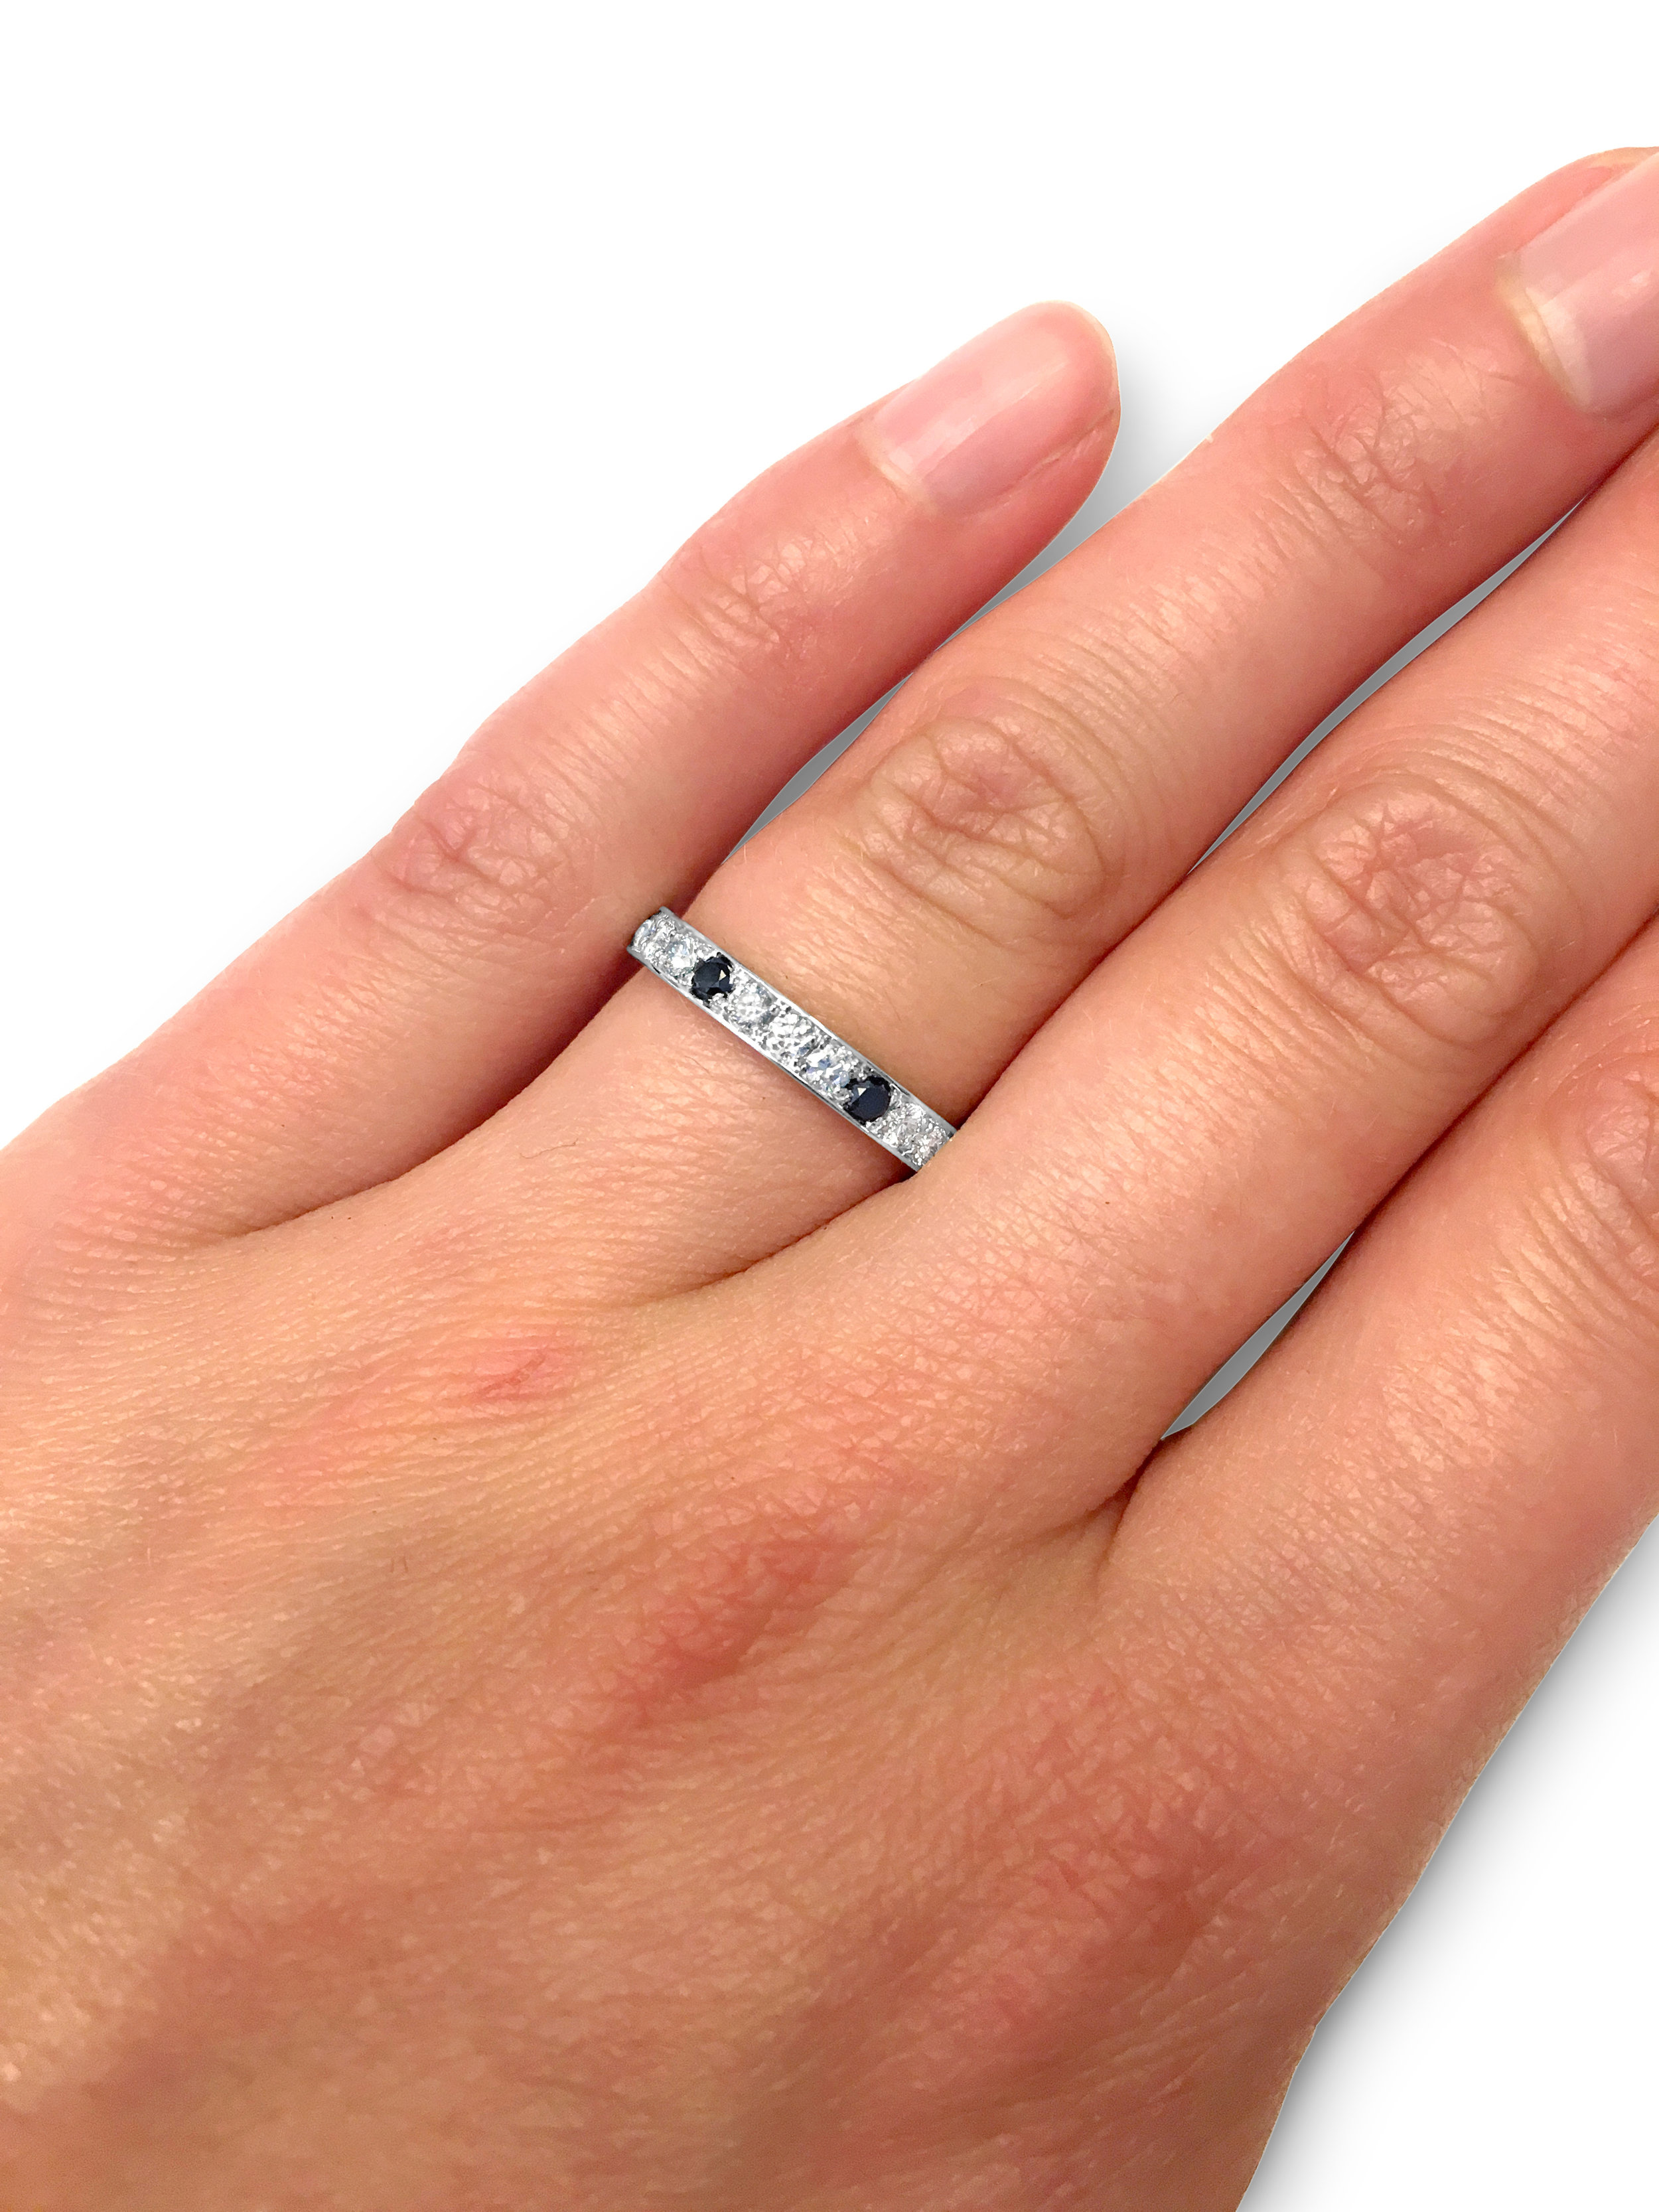 Black and White Diamond Eternity Ring Hand Modelled